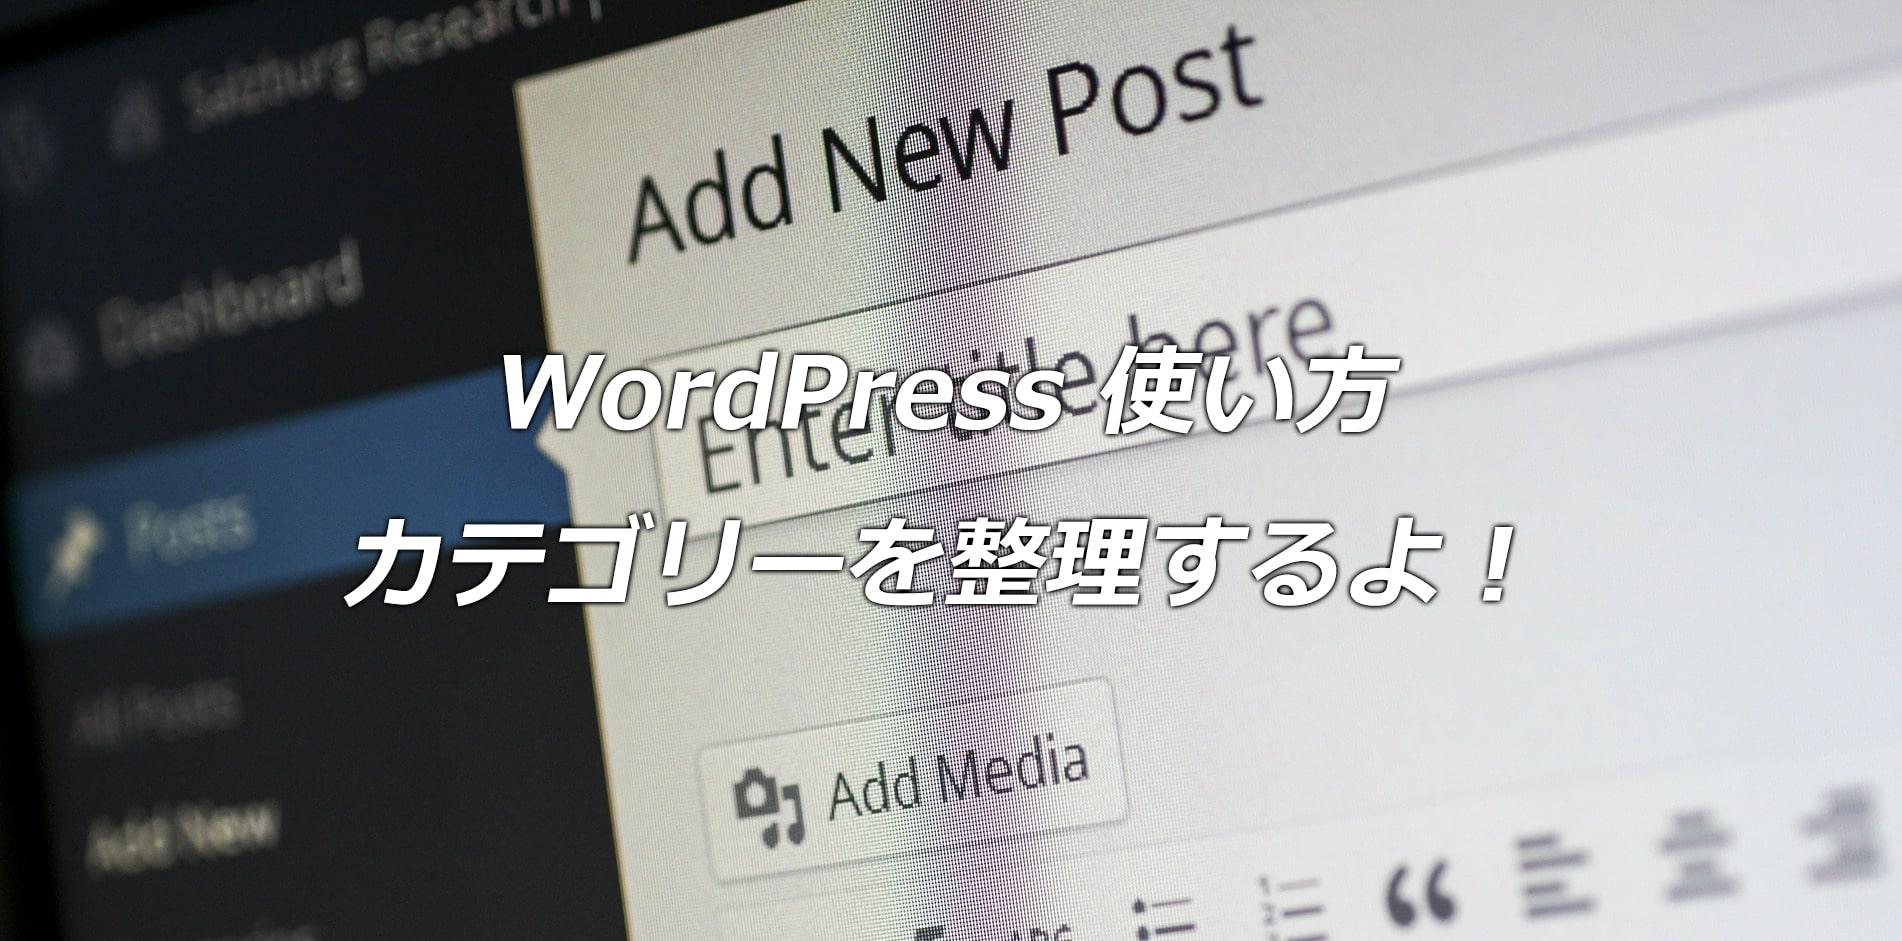 WordPressのカテゴリーを整理するよ